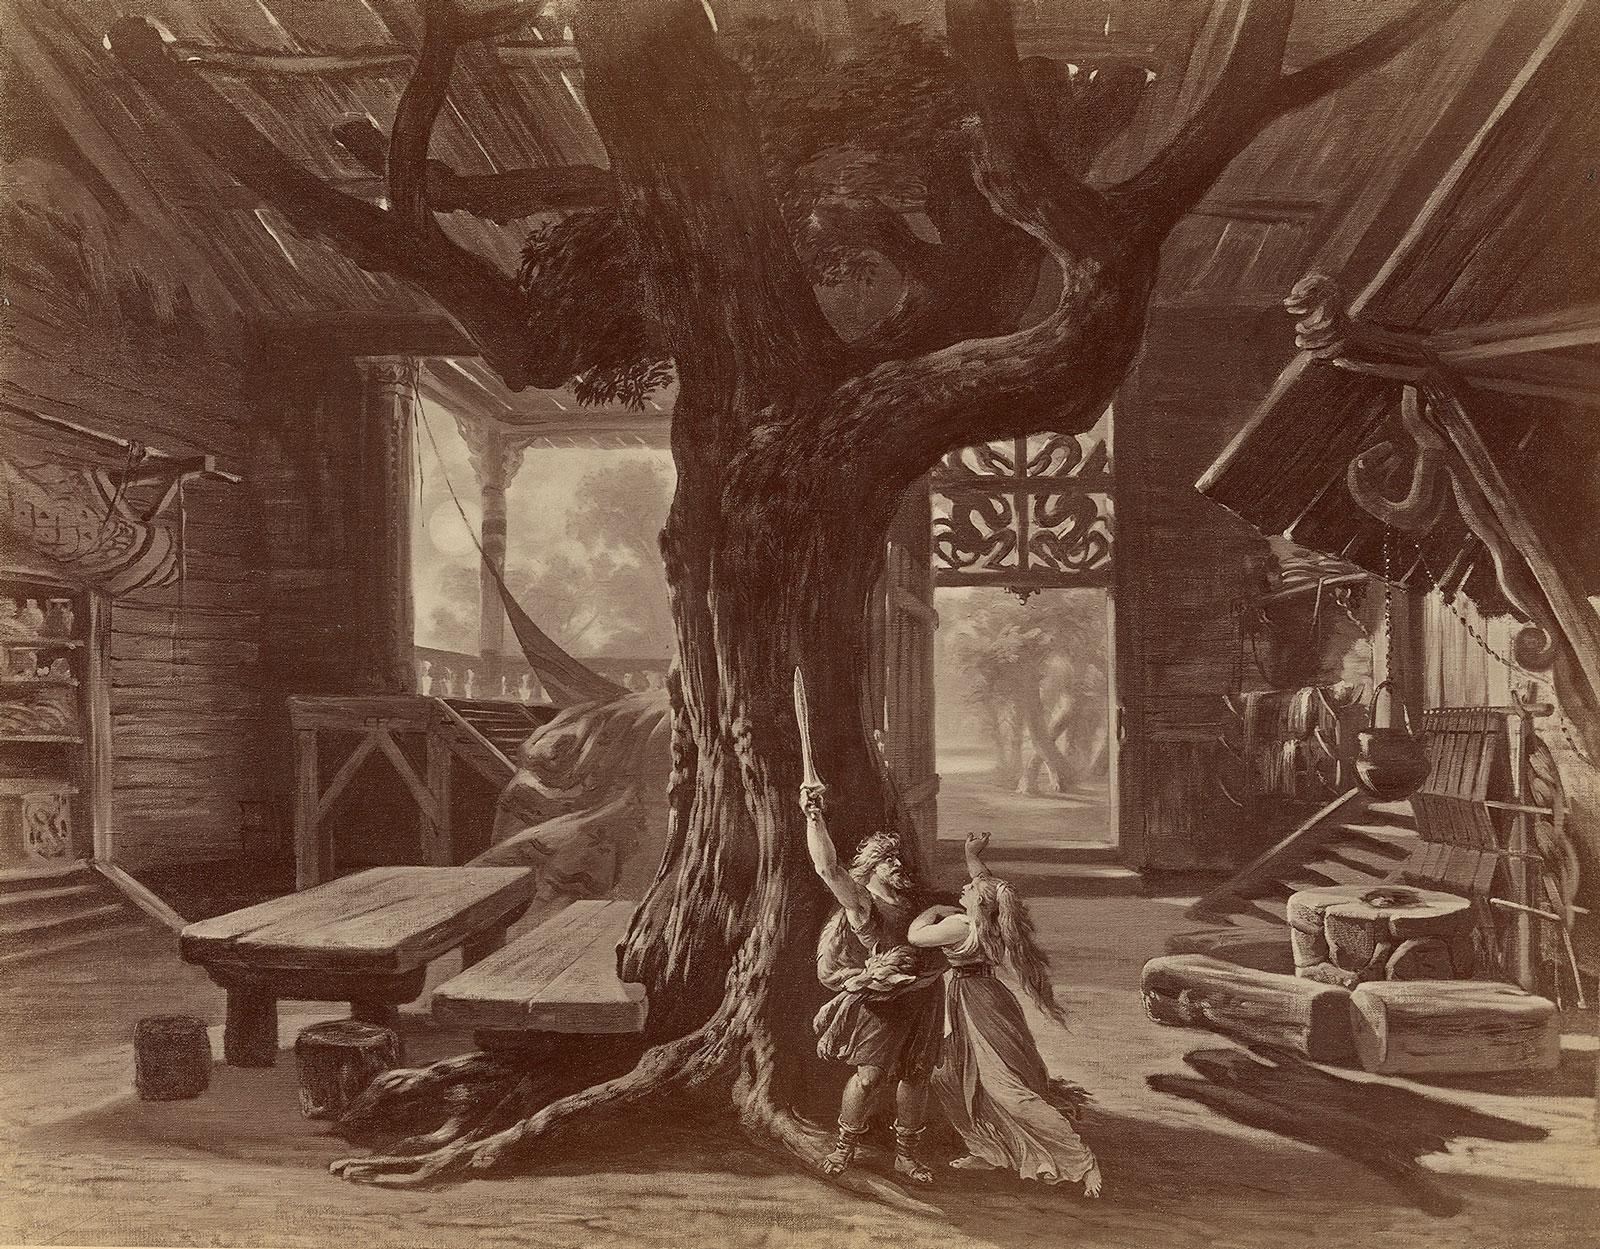 A stage design for Die Walküre, Act 1. Vienna: V. Angerer, by Joseph Hoffmann, circa 1878